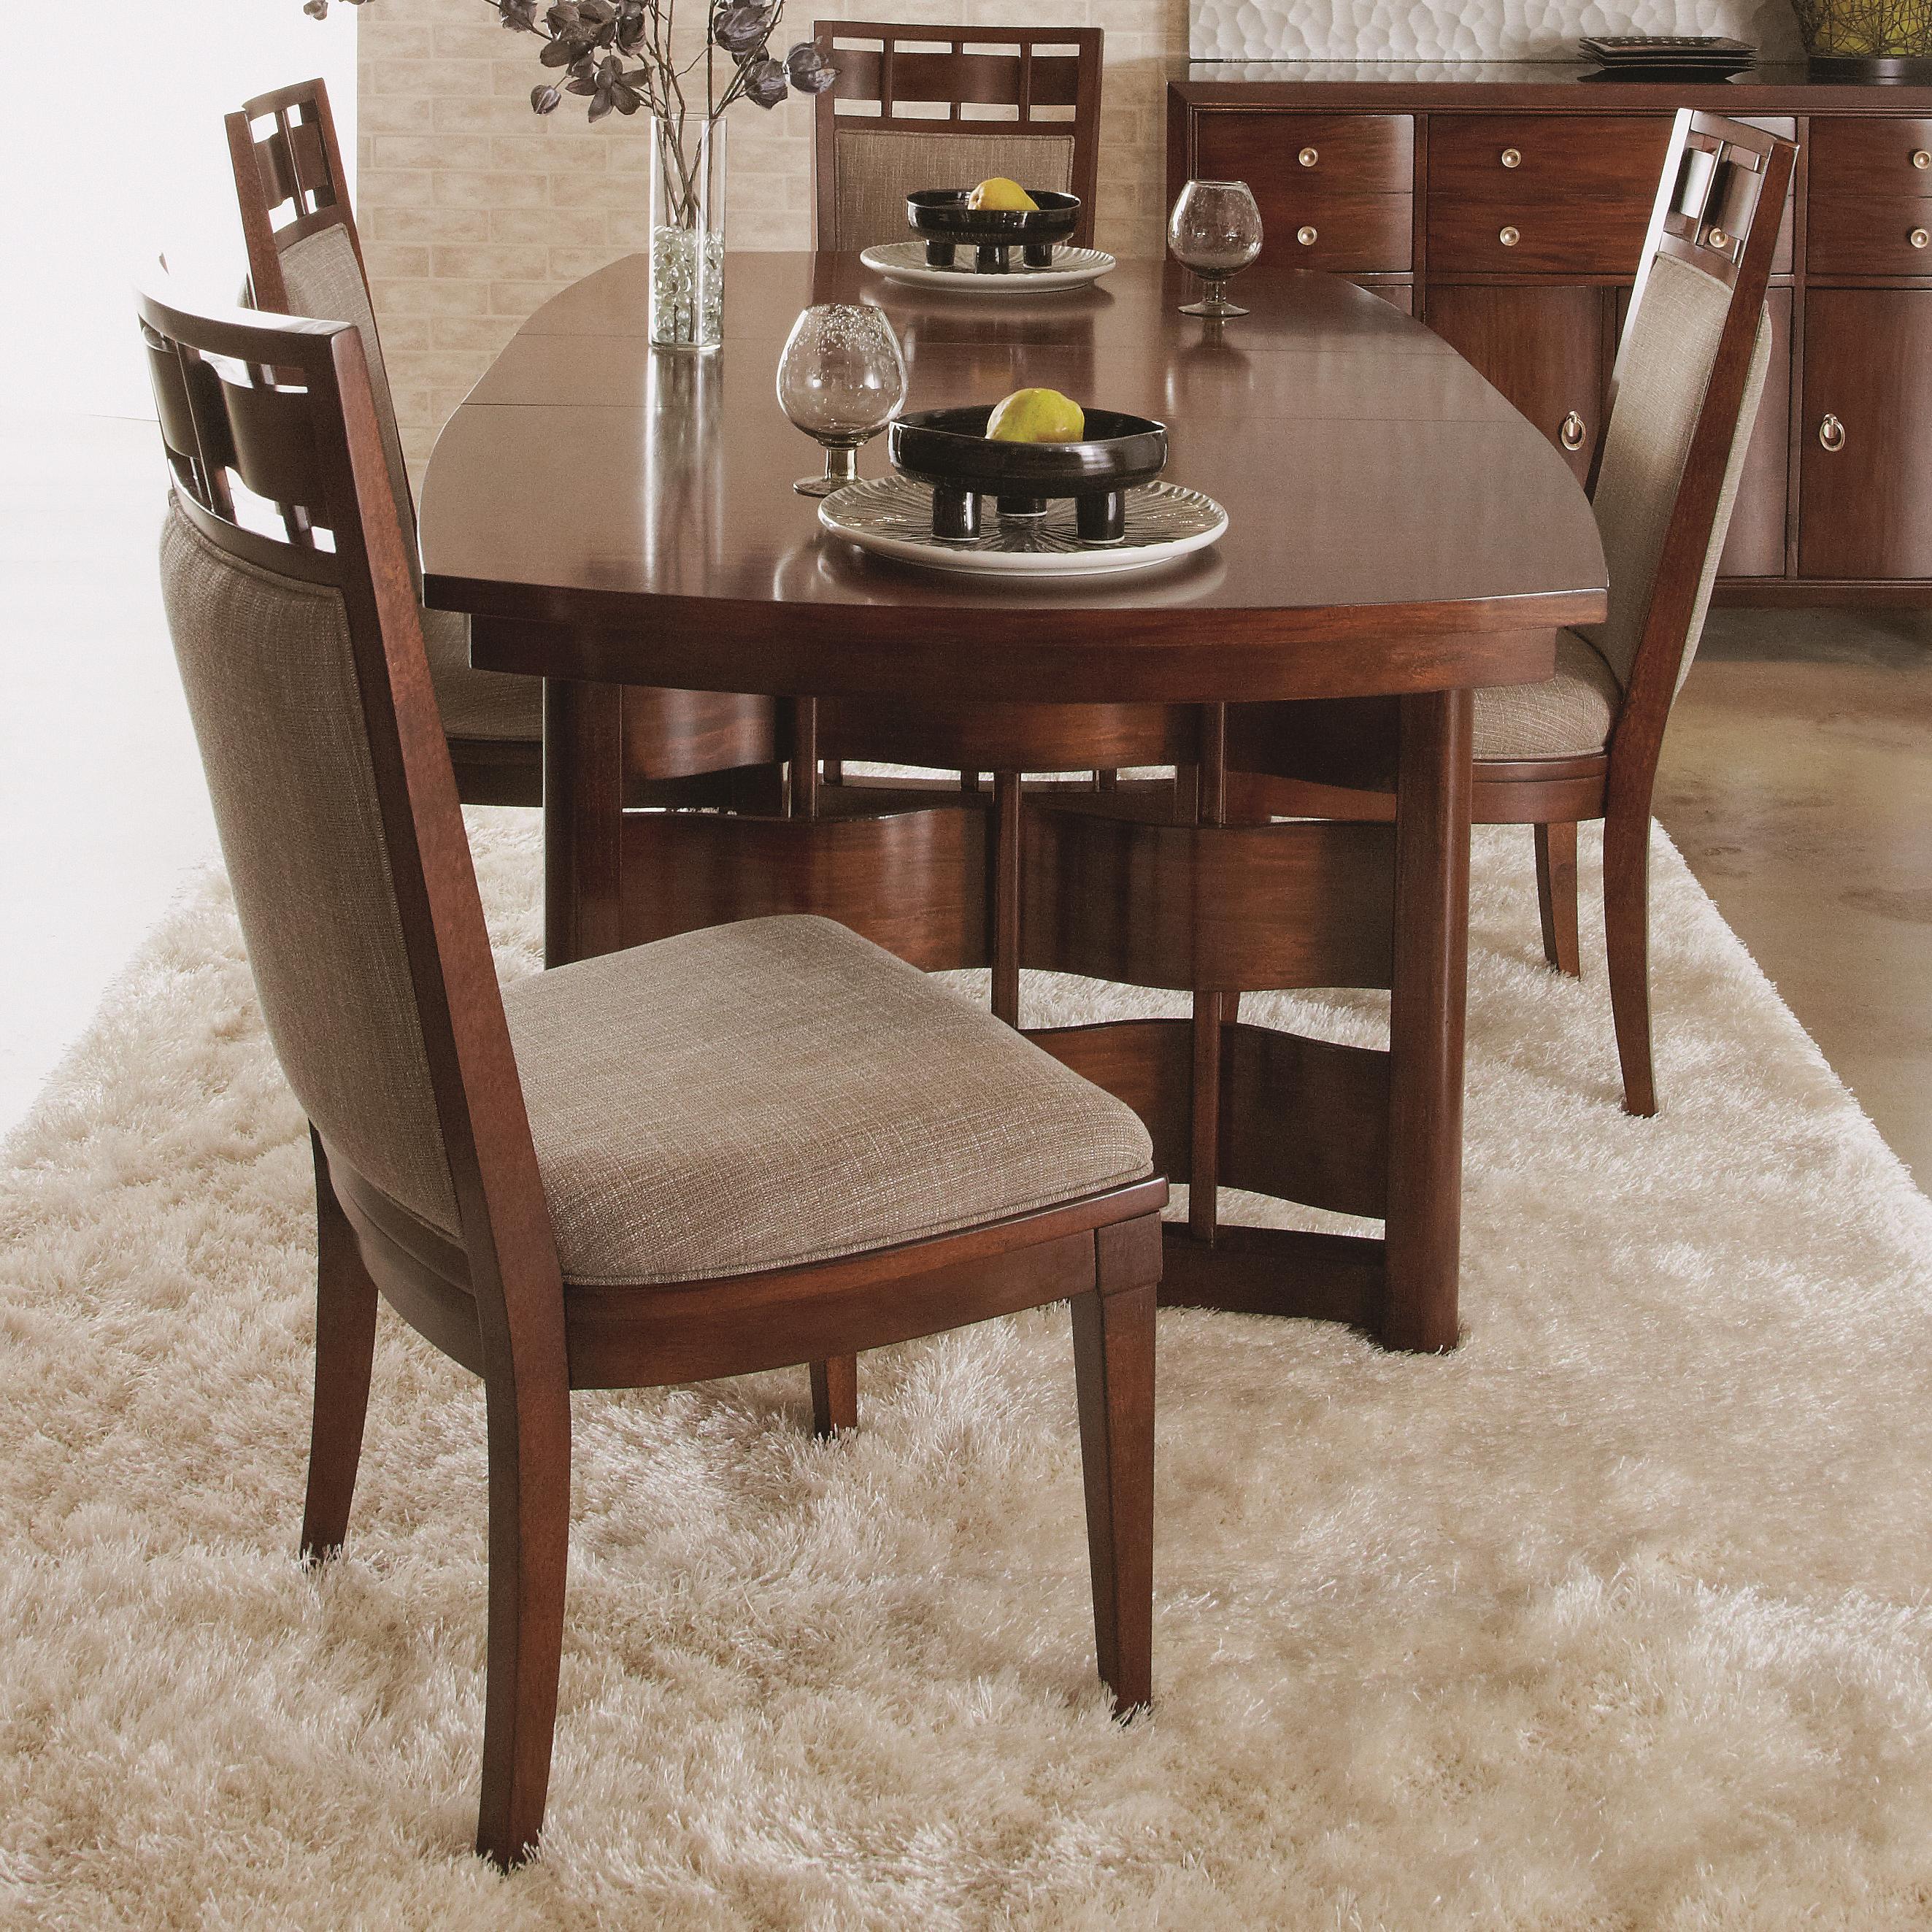 Morris Home Furnishings Augusta Augusta 5 Piece Dining Set - Item Number: 697-406+4x434